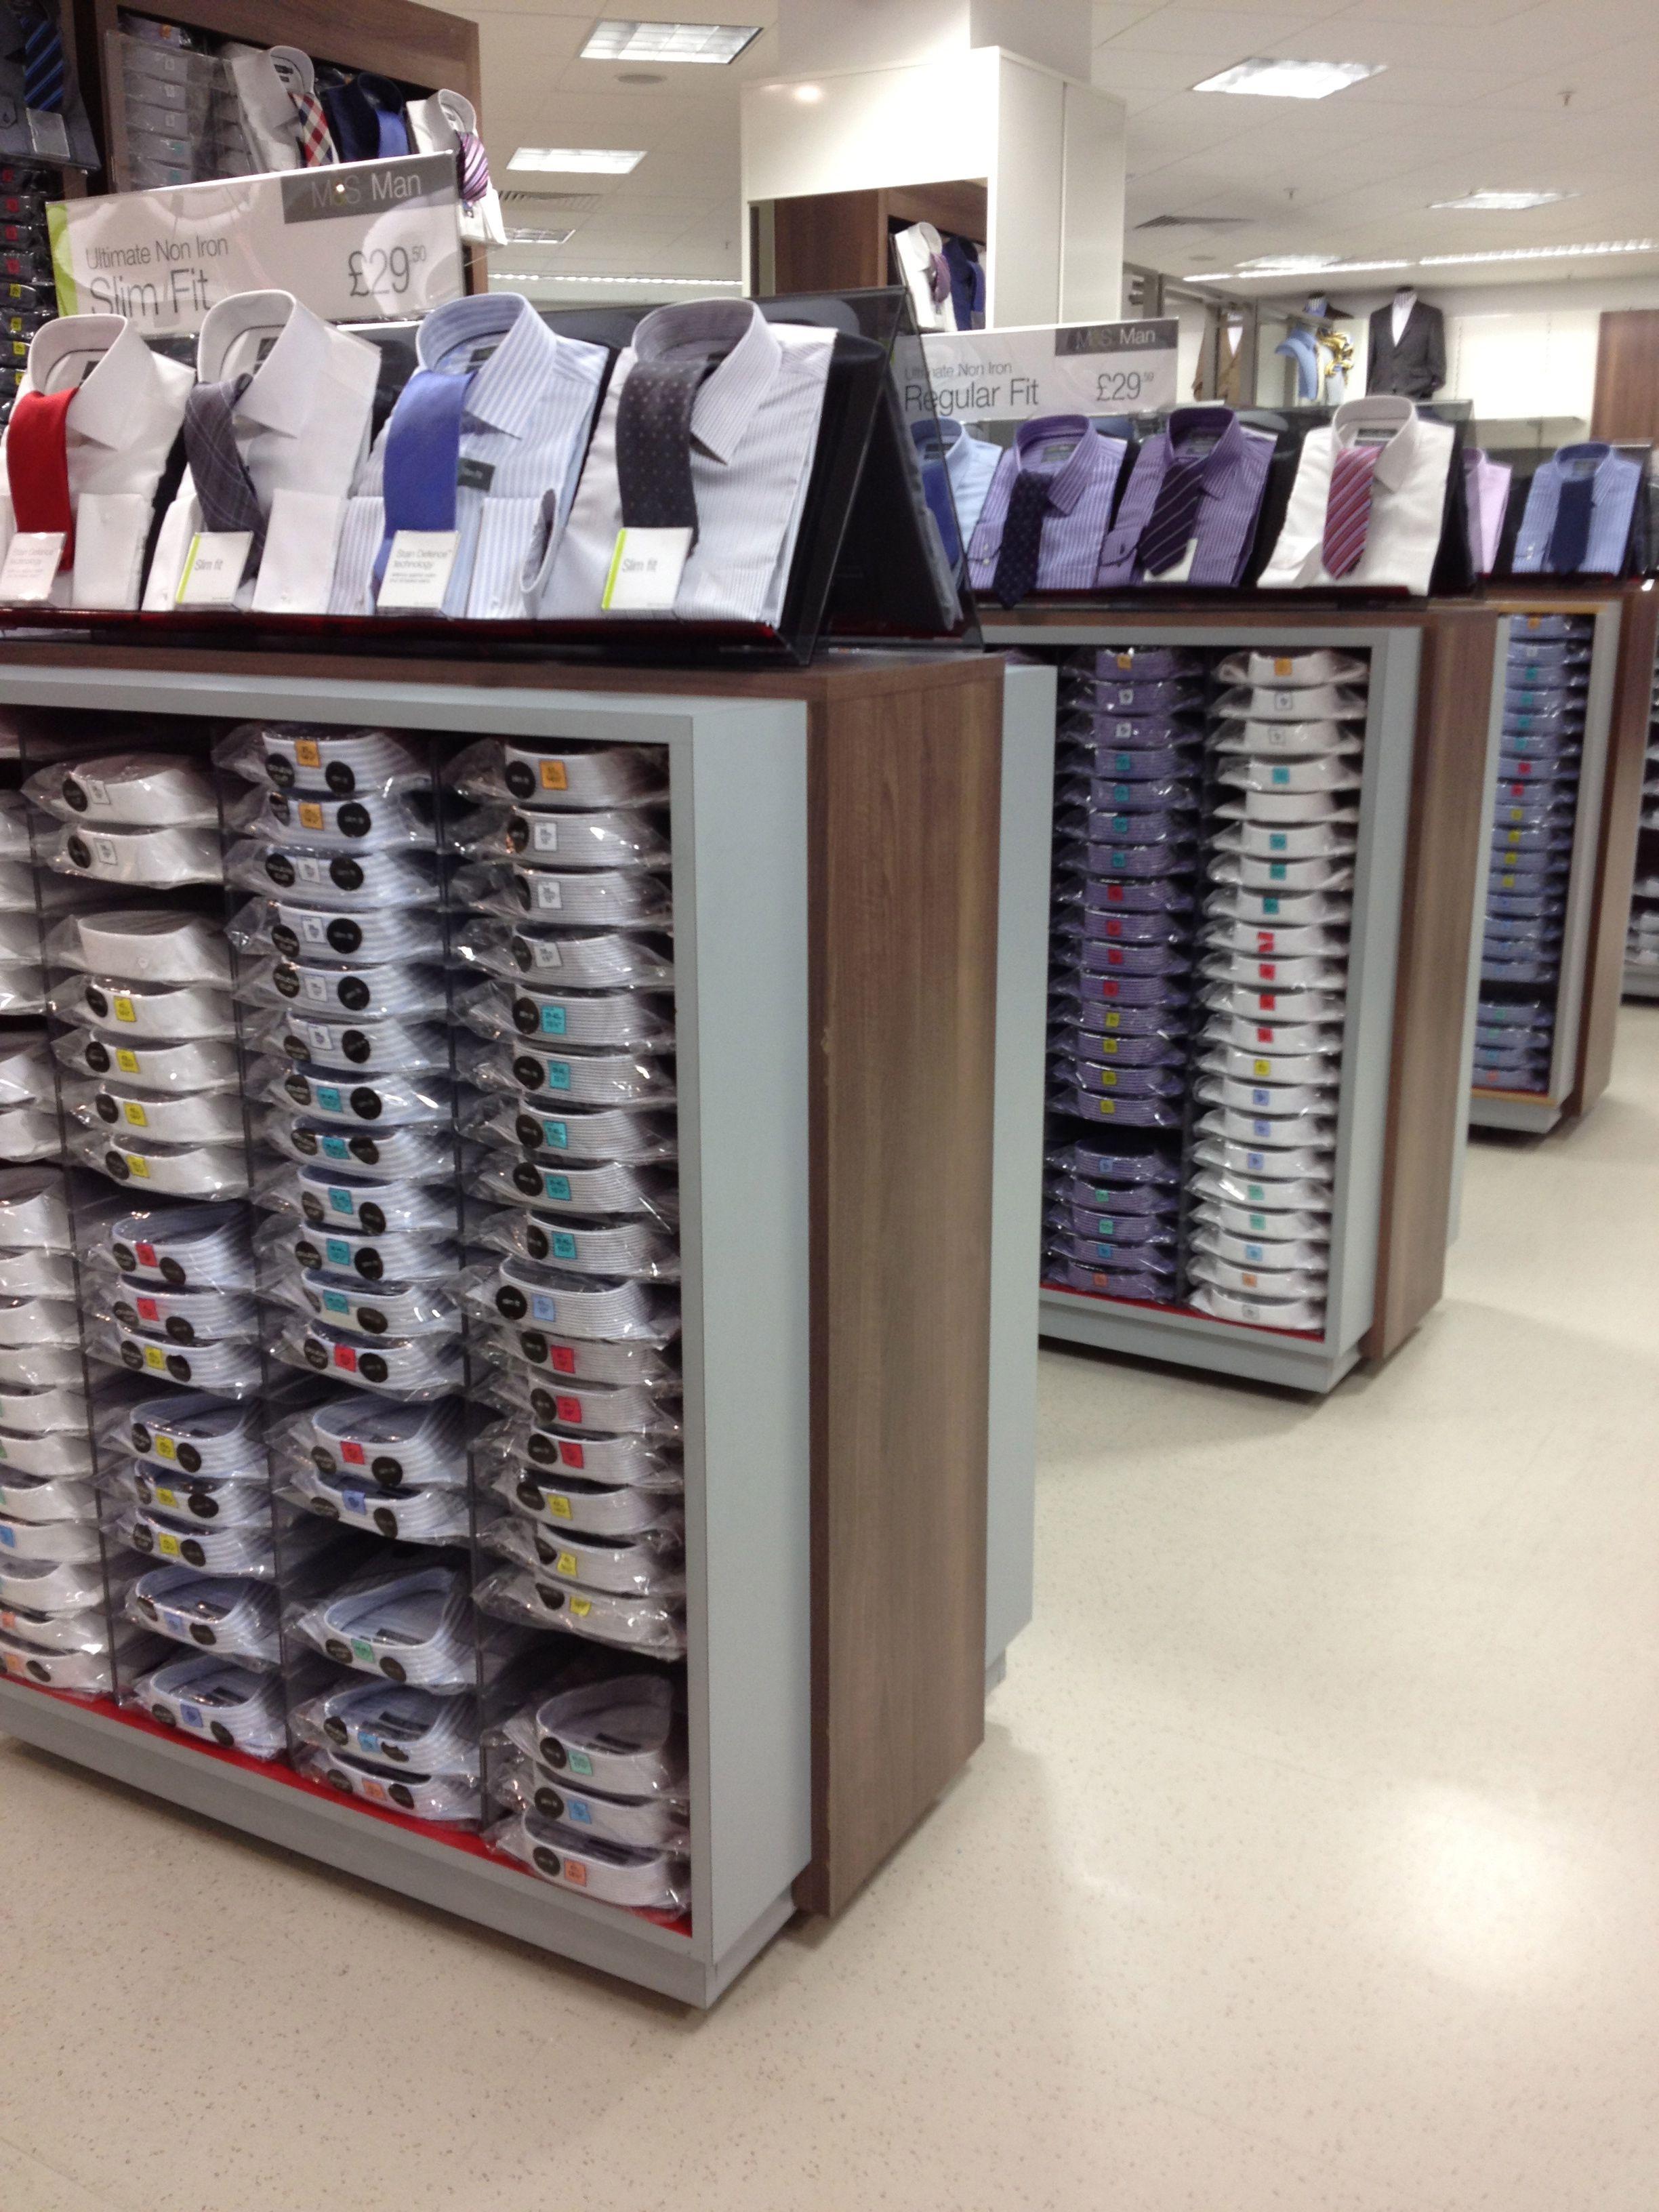 760c596b8 Mens - Formal Shirts Clothing Store Interior, Merchandising Displays, Store  Displays, Formal Shirts